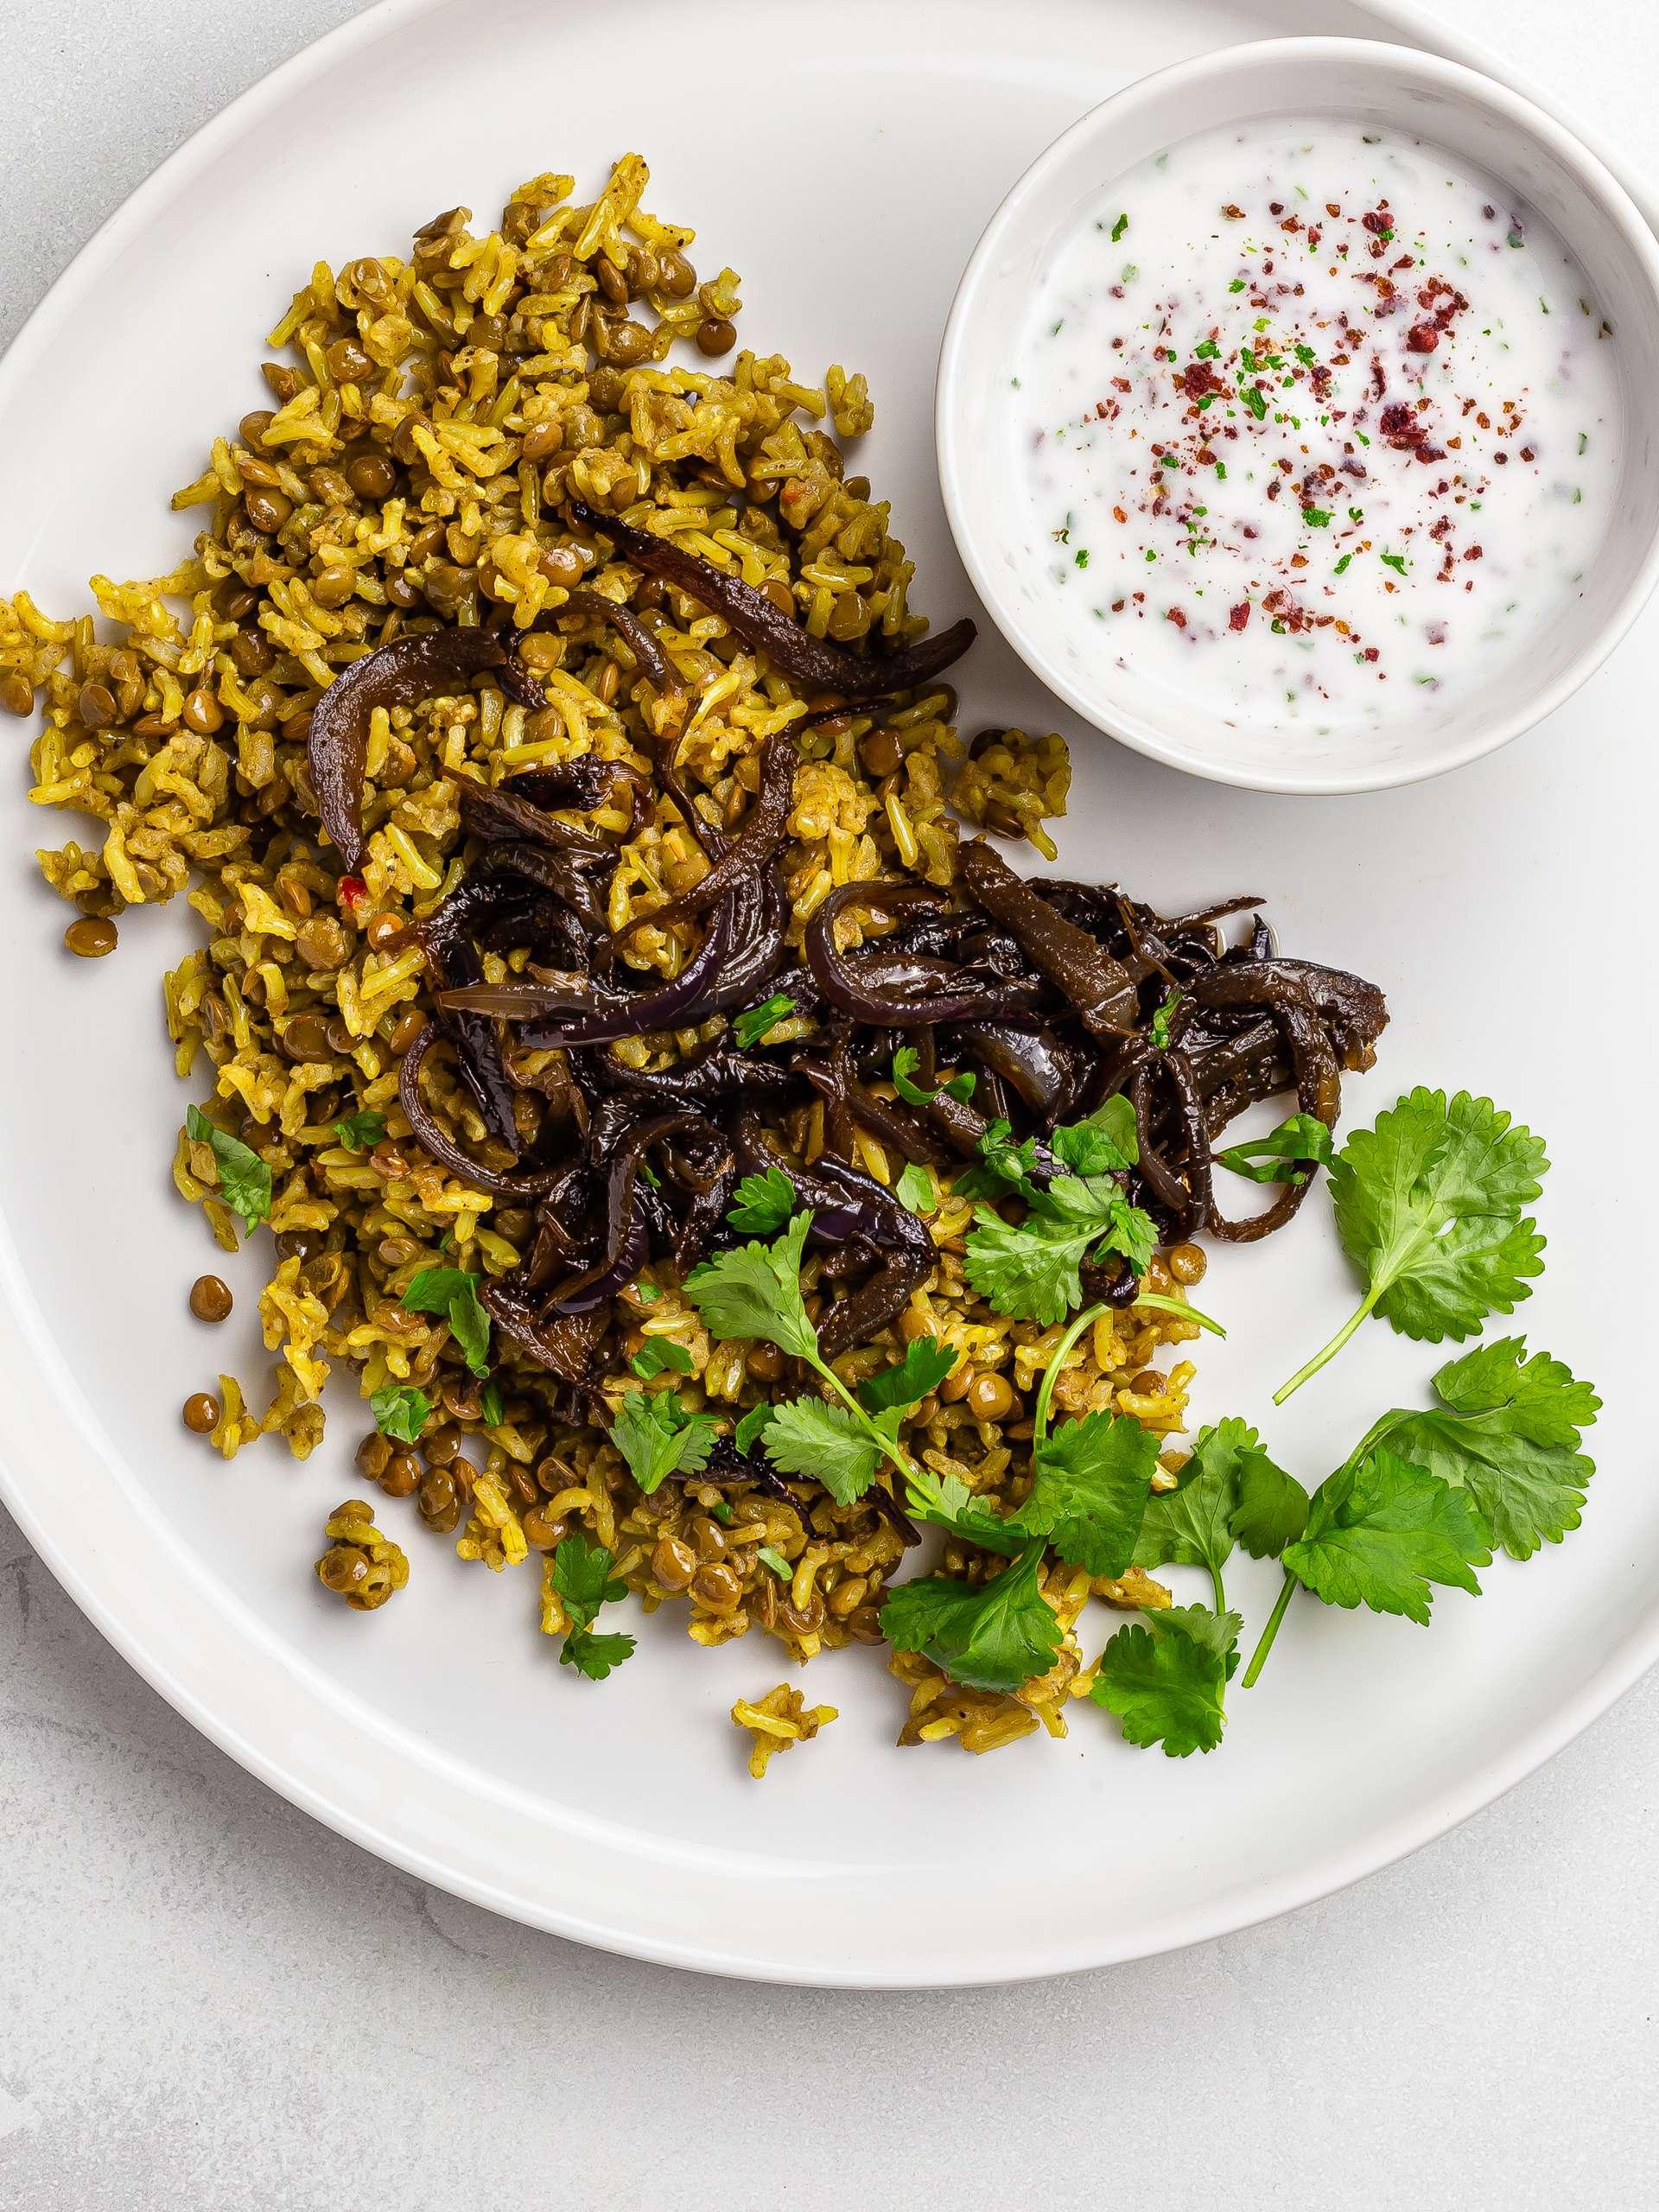 Lebanese Mujadara (Caramelized Onions and Lentil Rice)